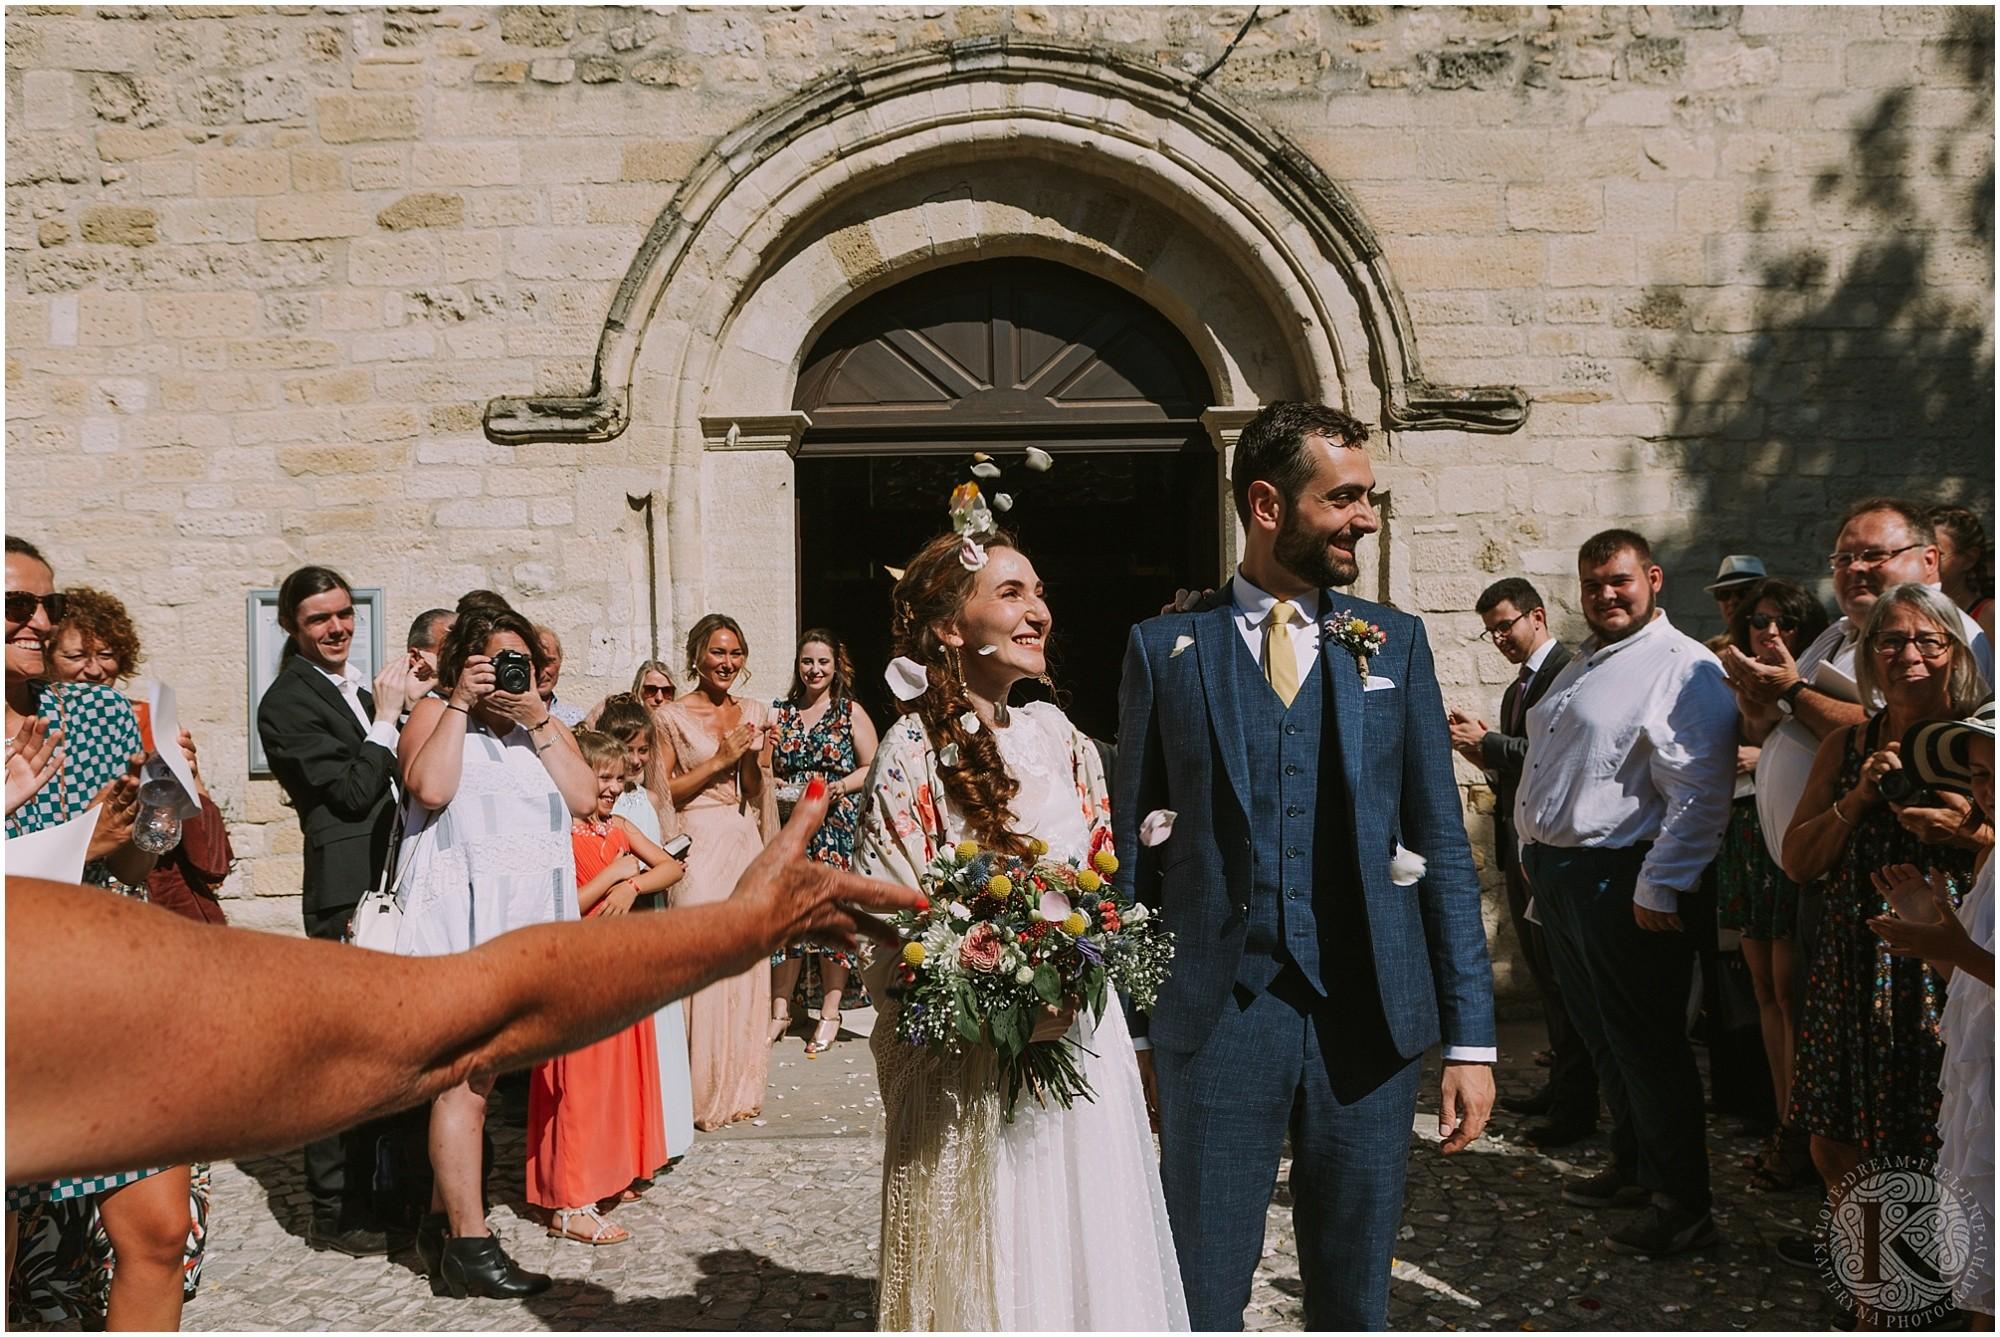 Kateryna-photos-photographe-mariage-vaucluse-provence-avignon-ferme-st-hugues_0036.jpg